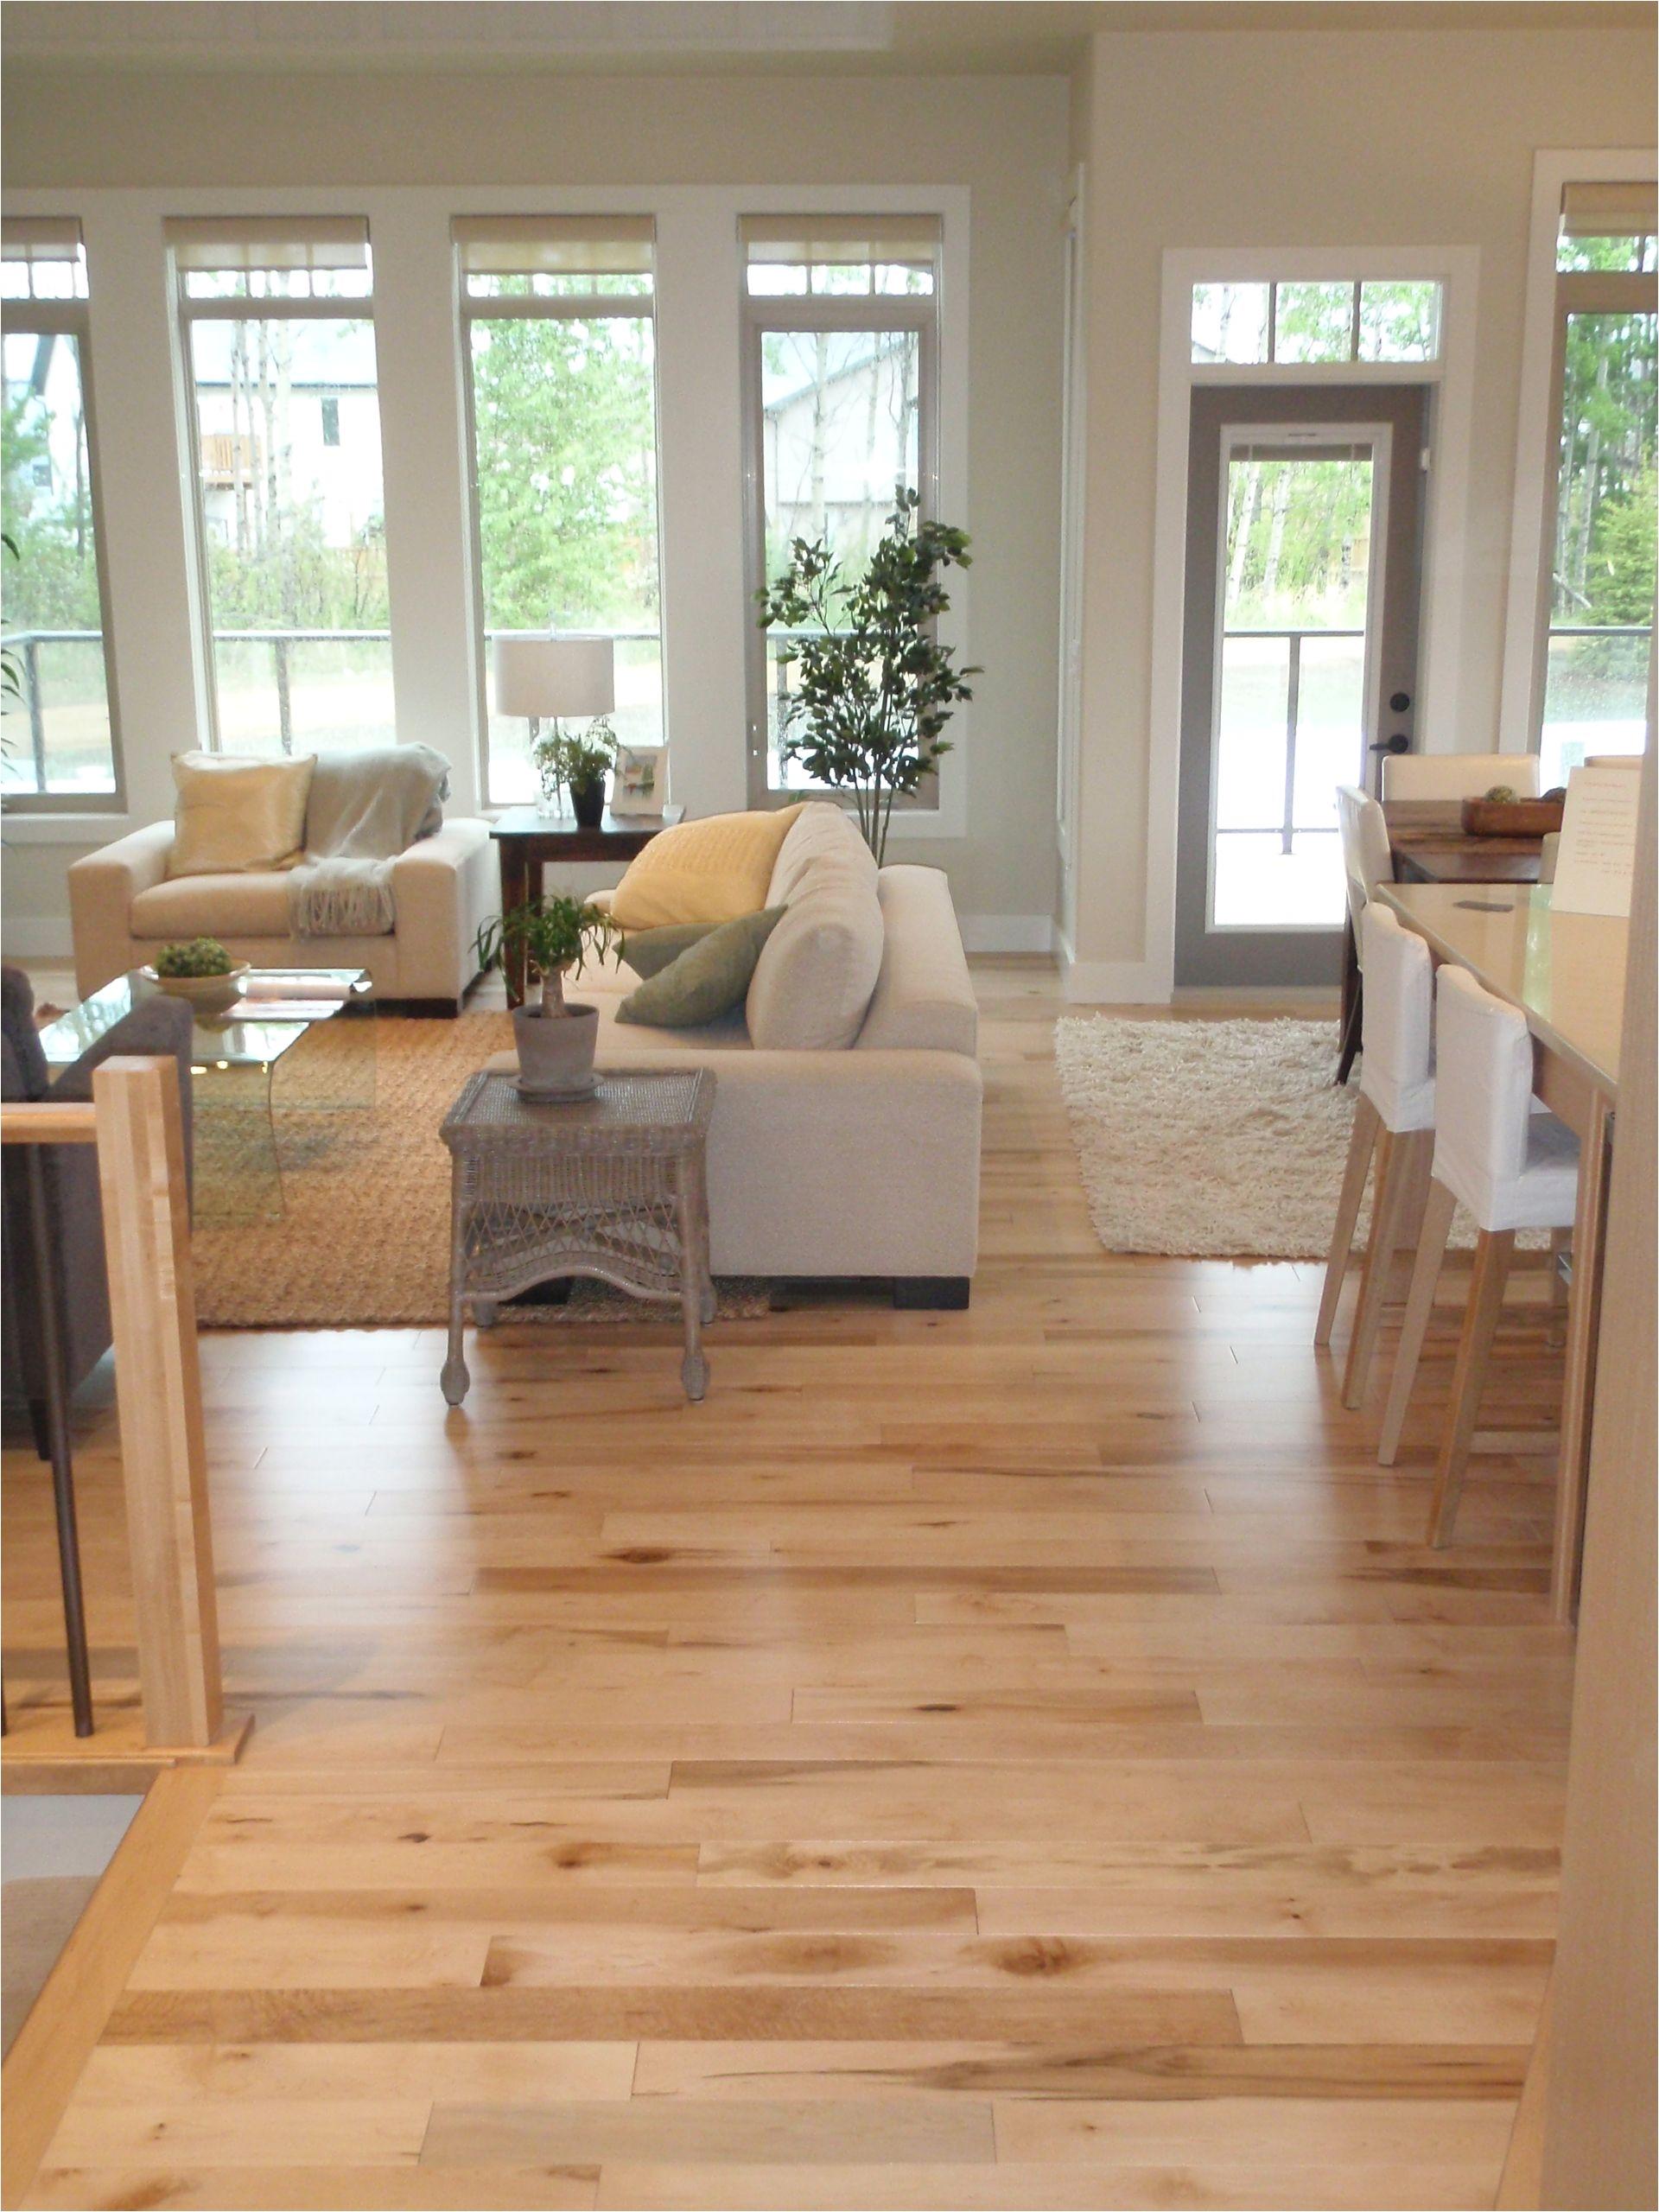 hardwood floors hardwood flooring love how the light wood makes everything look brighter